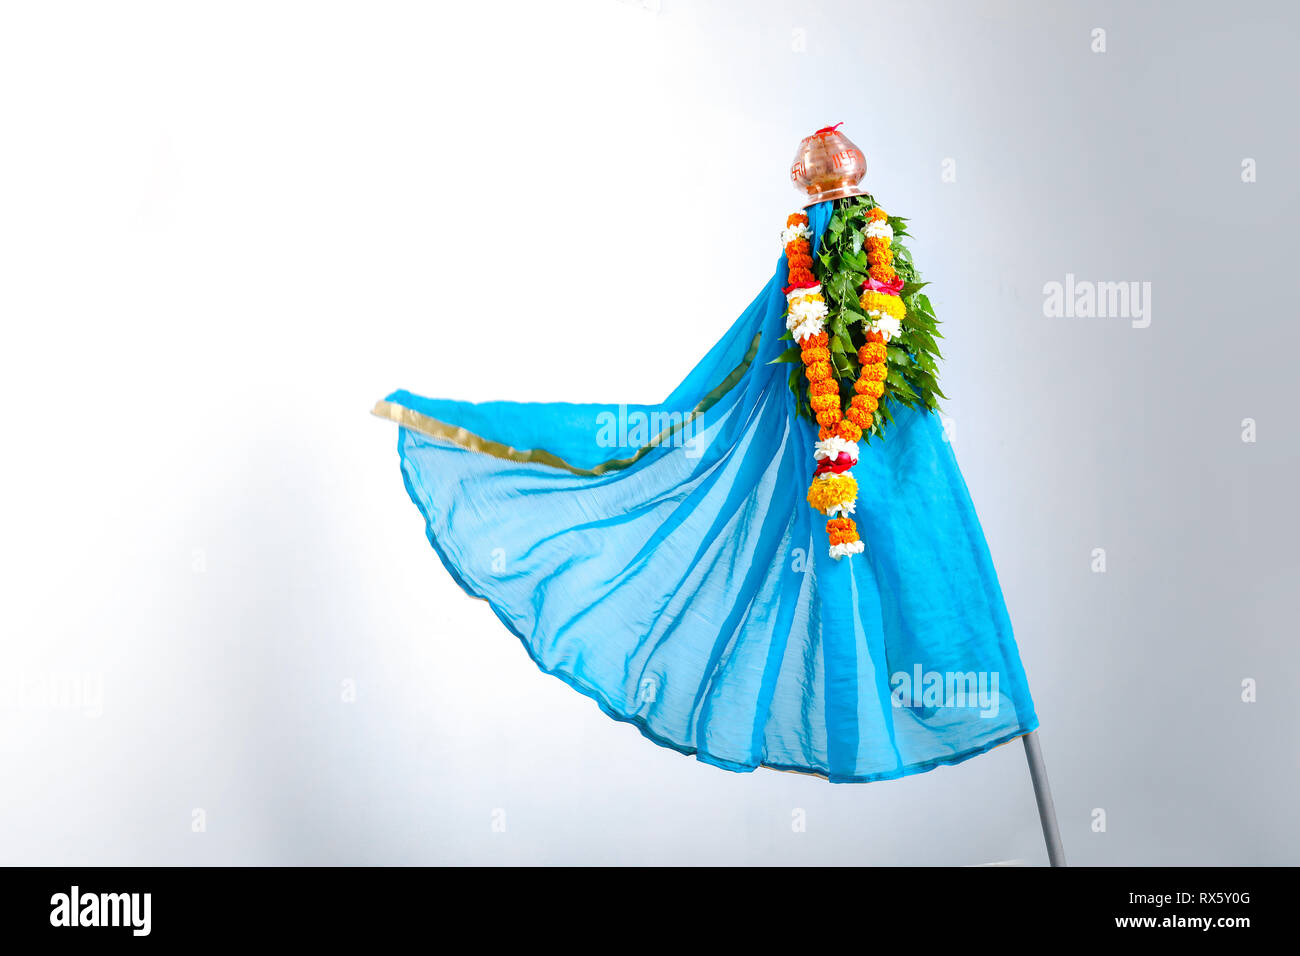 Gudi Padwa Marathi New Year - Stock Image